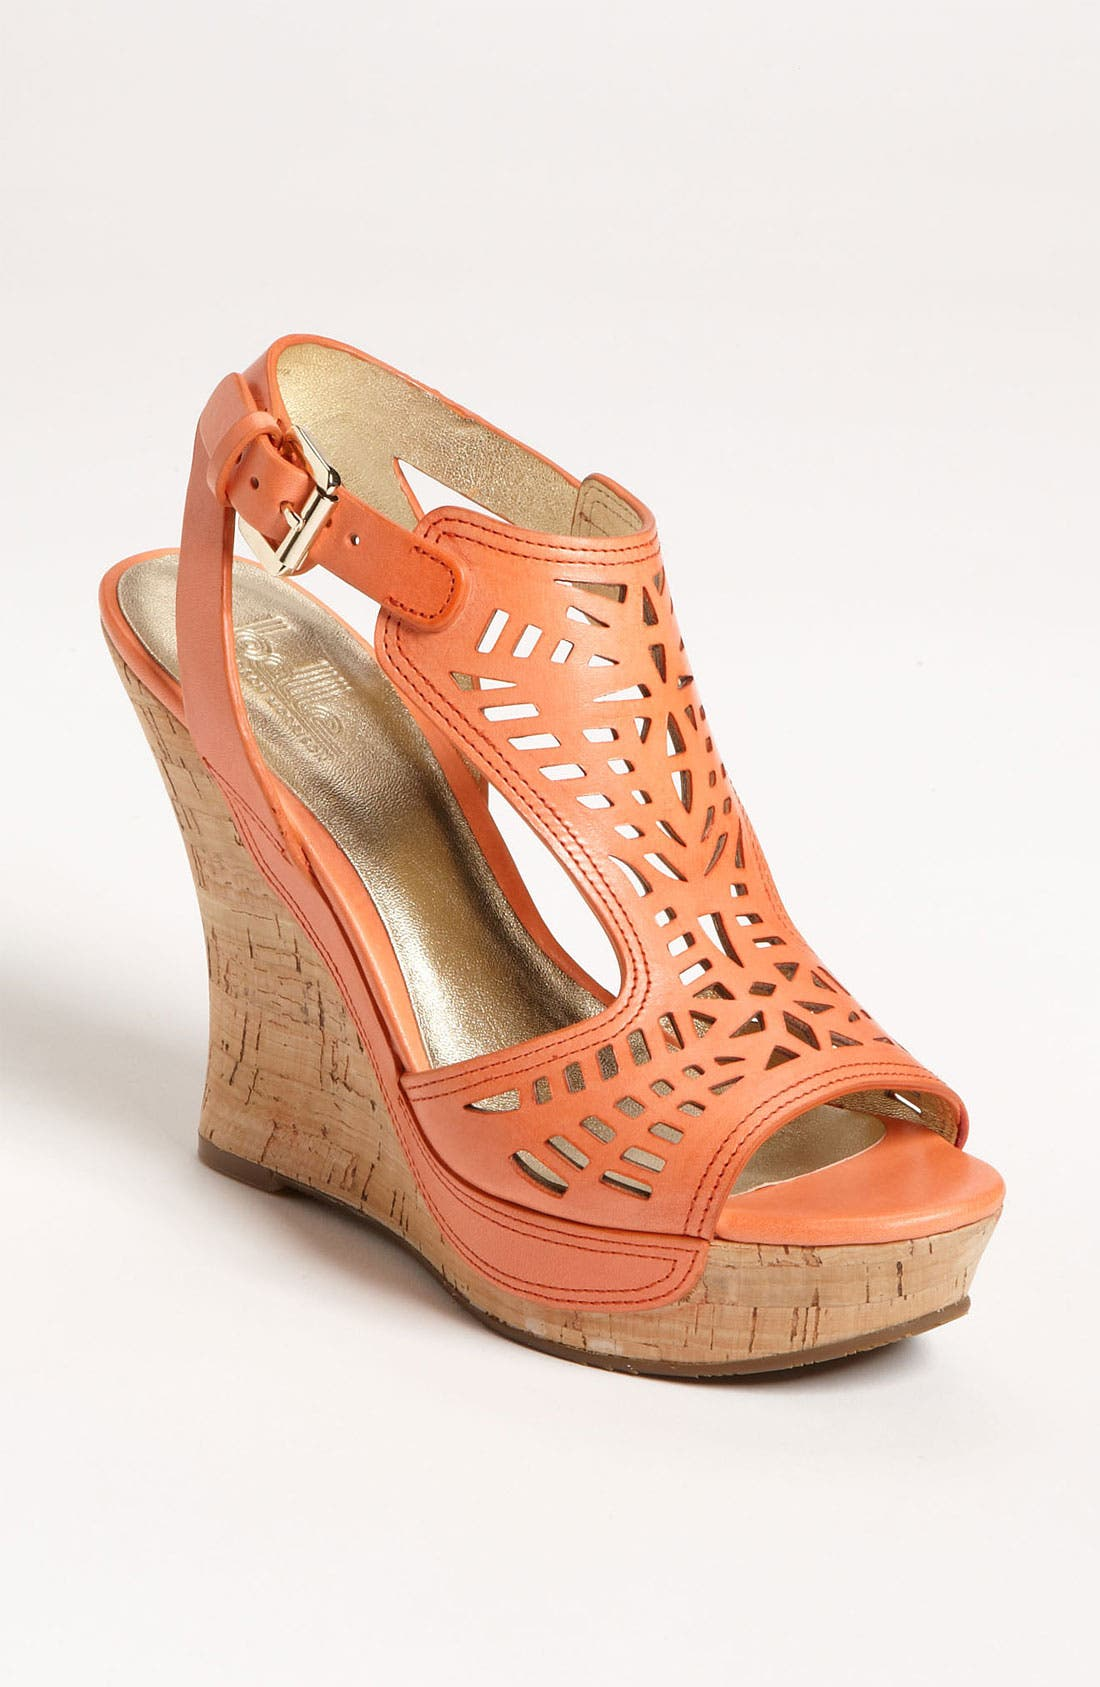 Alternate Image 1 Selected - Belle by Sigerson Morrison 'Babita' Wedge Sandal